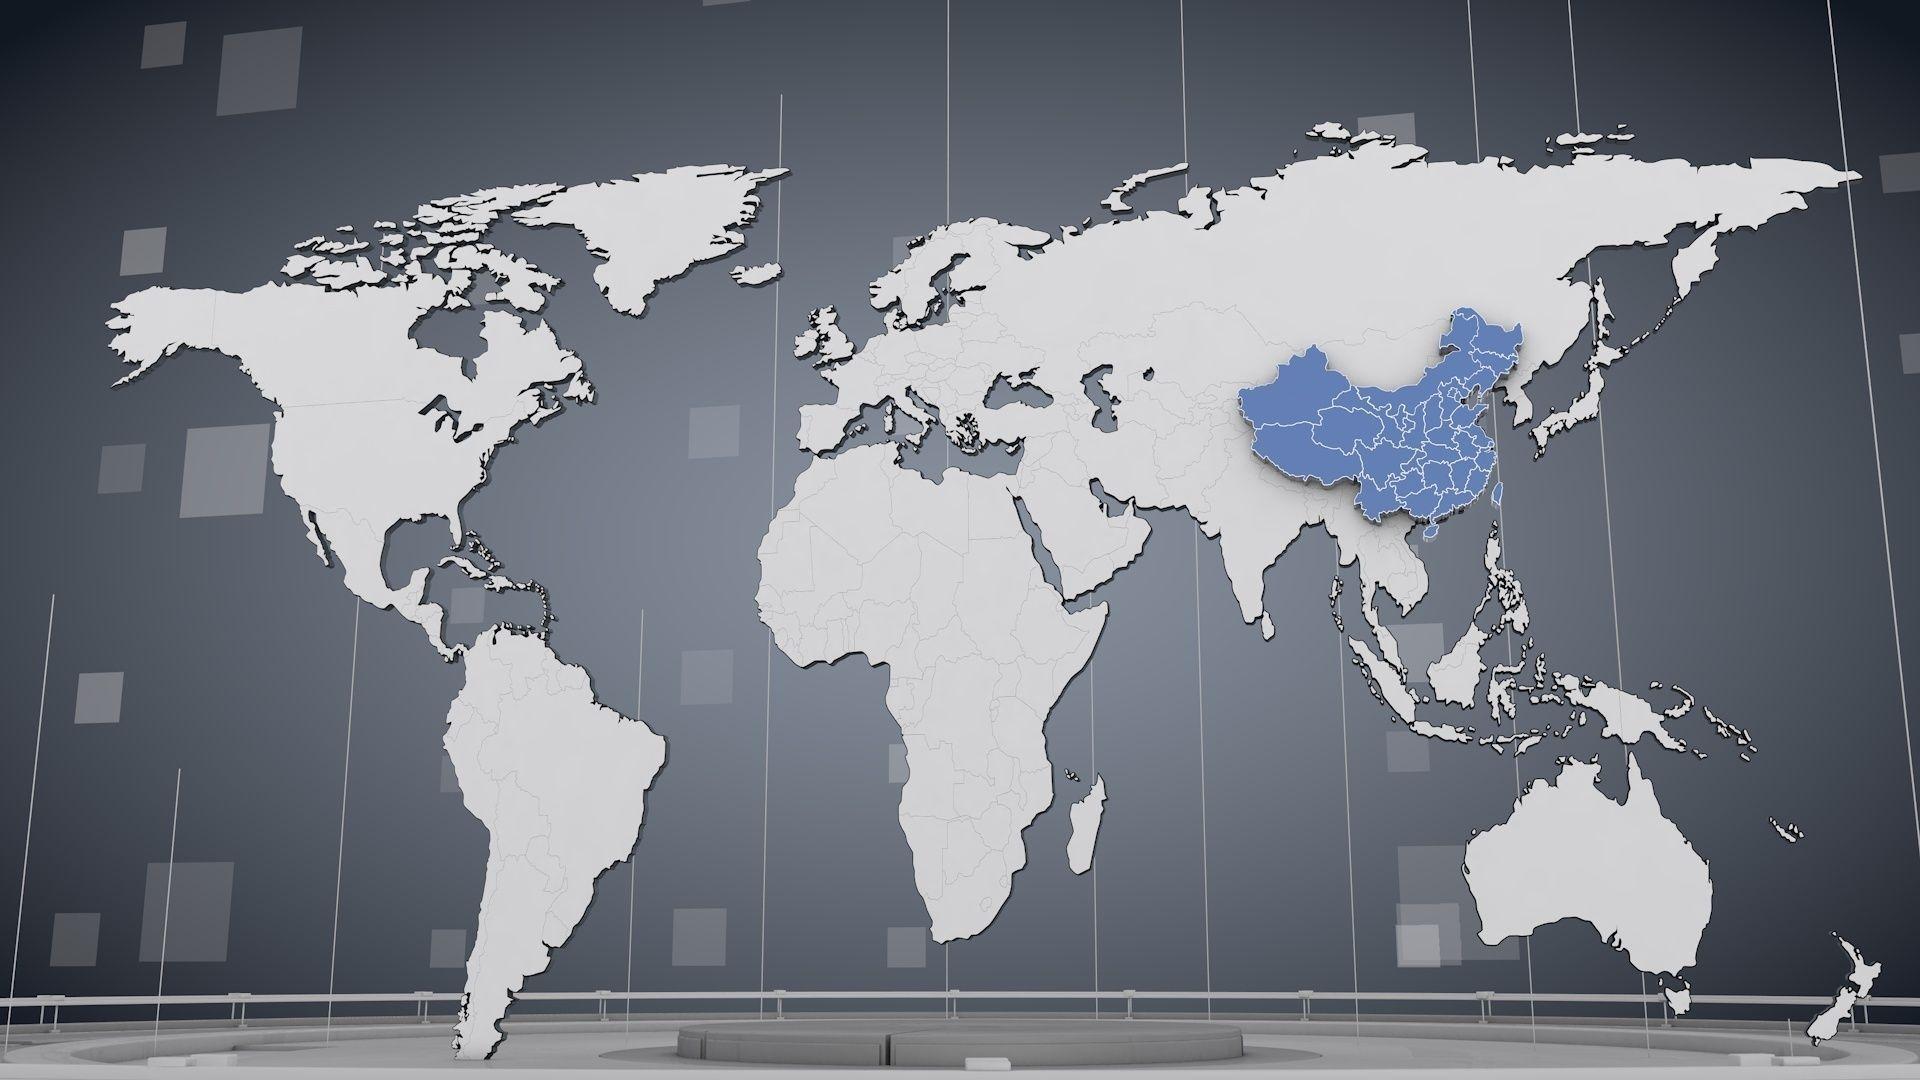 3d cinema 4d world map cgtrader cinema 4d world map 3d model fbx c4d 1 gumiabroncs Images